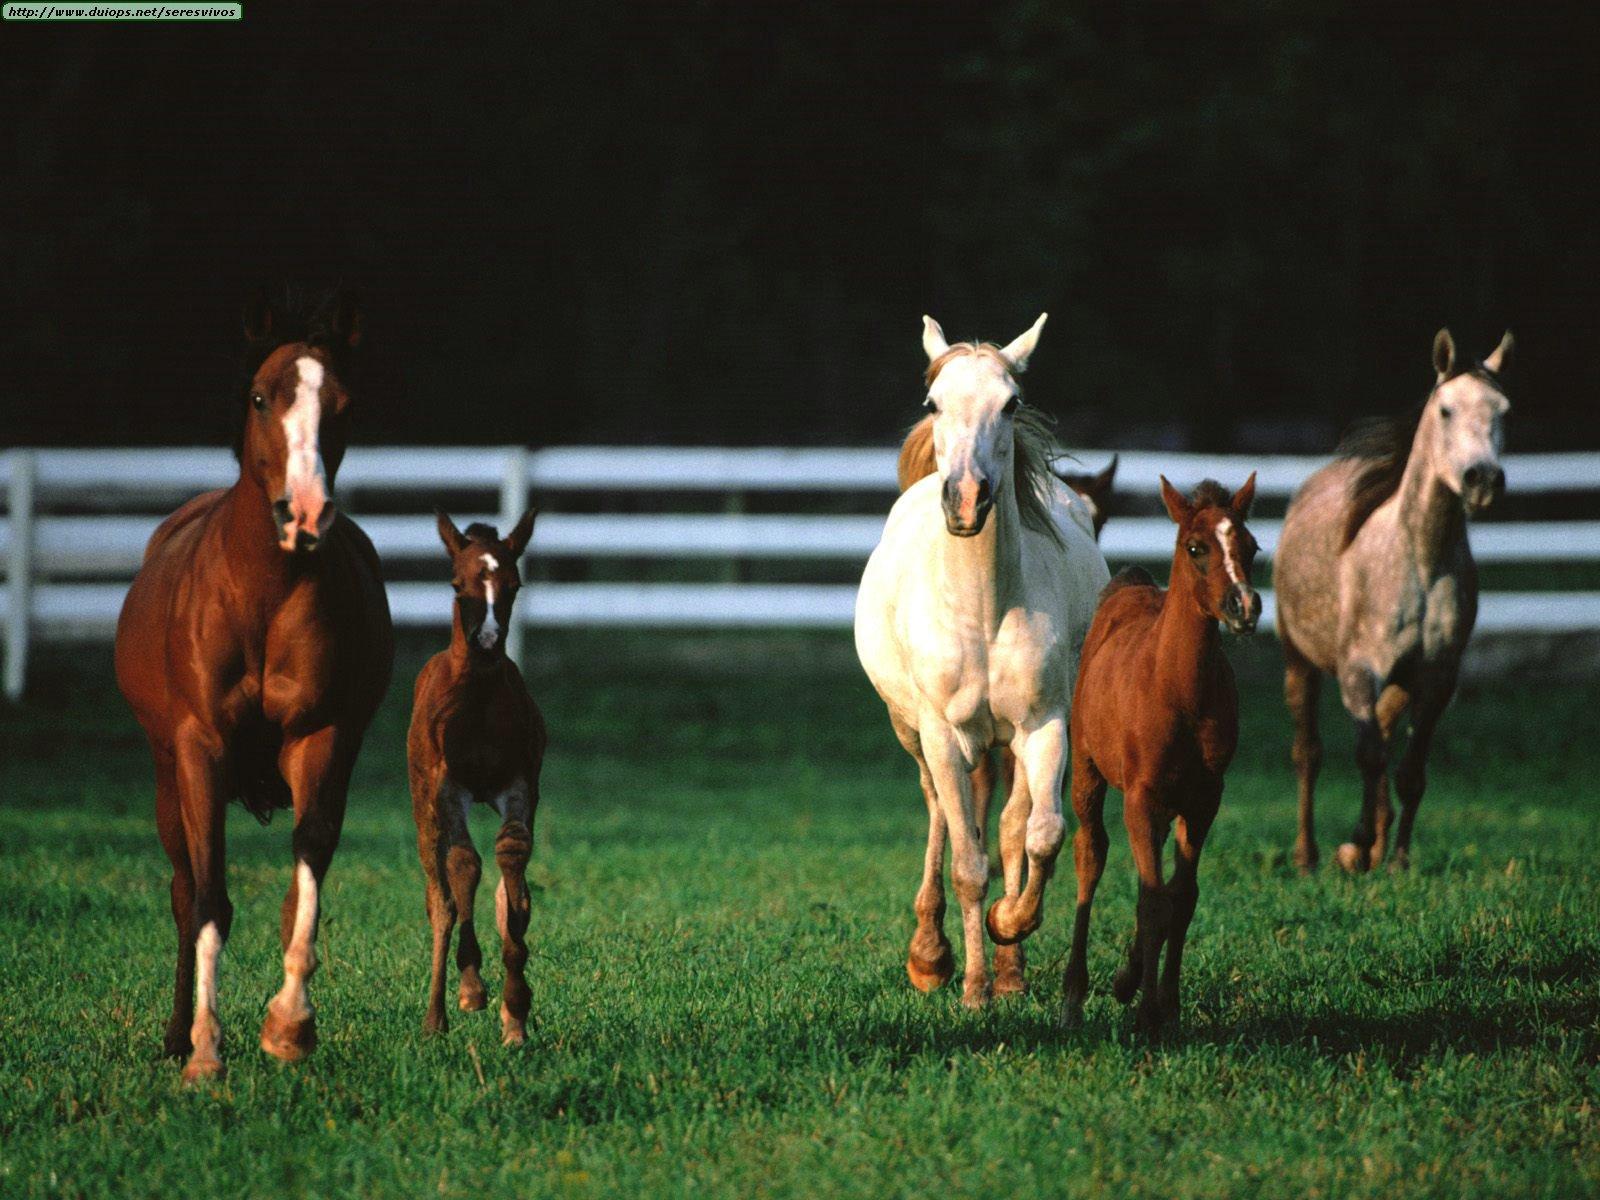 http://www.duiops.net/seresvivos/galeria/caballos/Animals%20Families_Romper%20Room,%20Arabian%20Horses..jpg